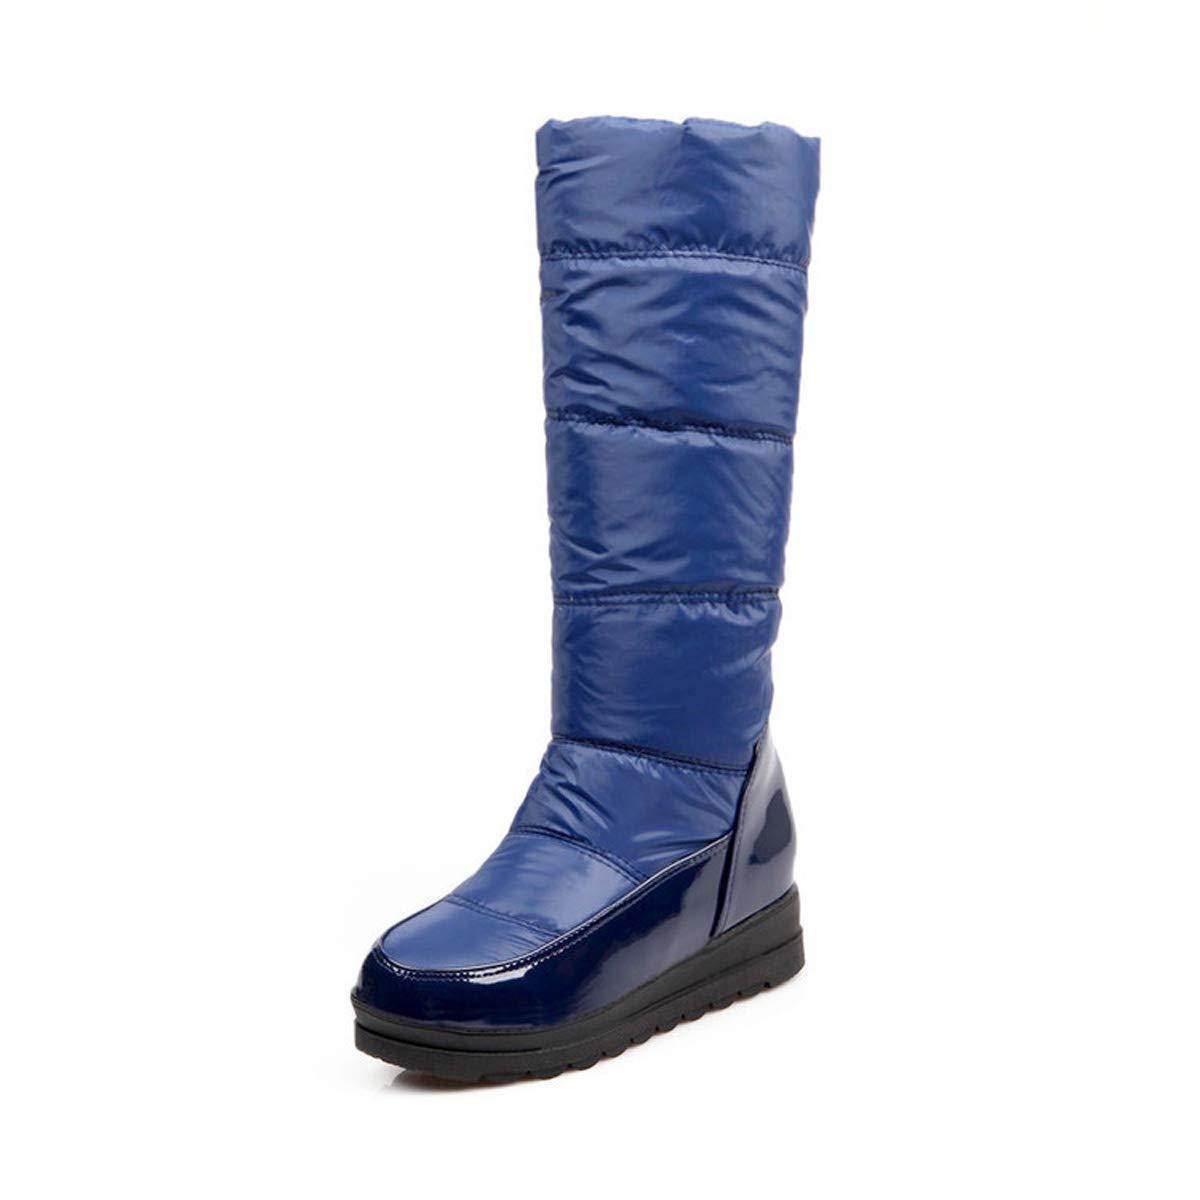 DANDANJIE Damen Winterstiefel Warme Wasserdichte Schneeschuhe Mittlere Wade Rutschfeste atmungsaktive Schuhe Blau 36EU